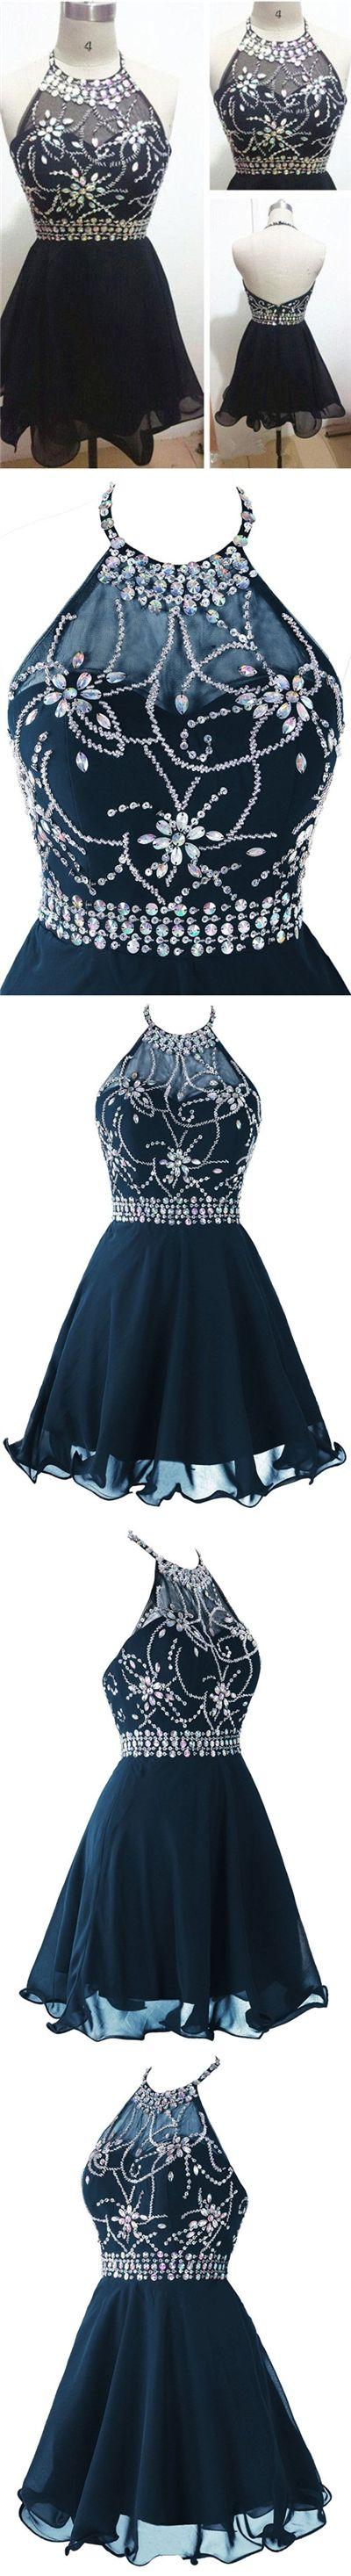 homecoming dress little black dress short prom dress party